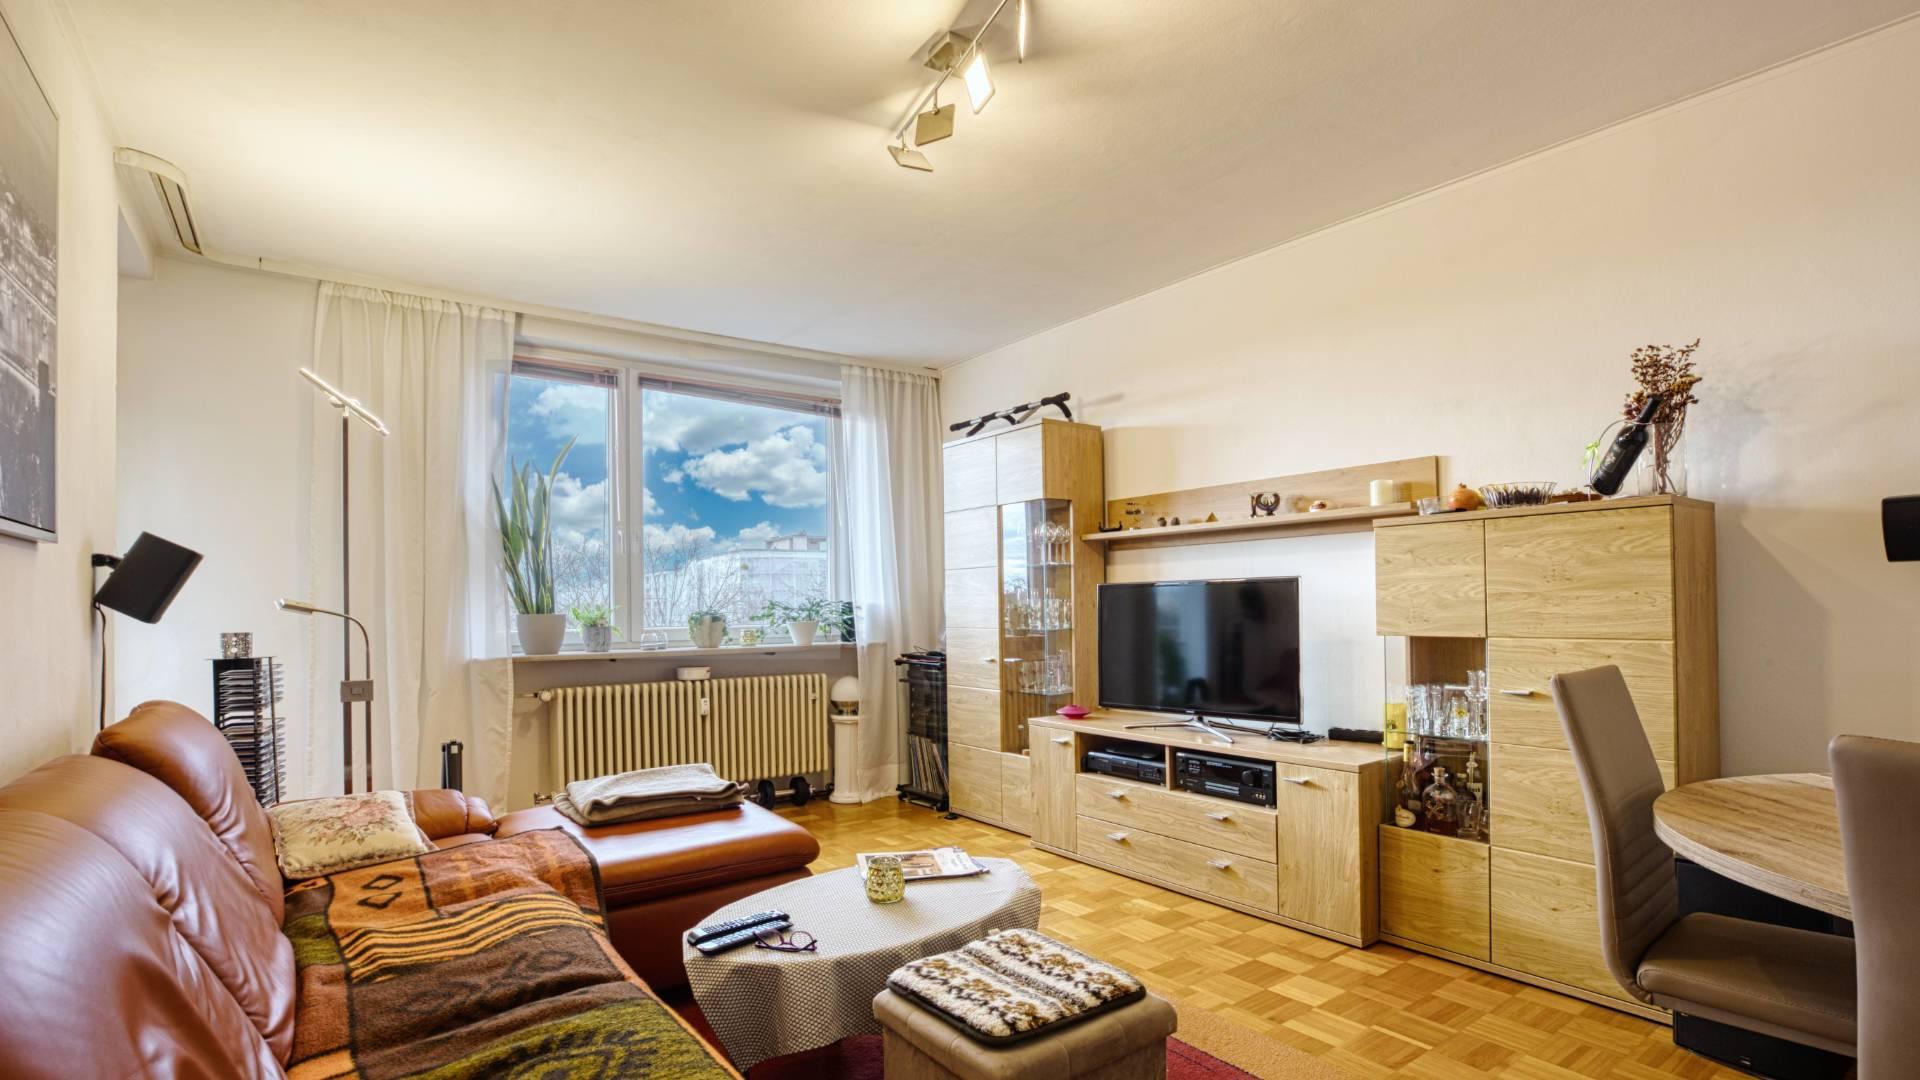 2-Zi-Whg Wohnzimmer